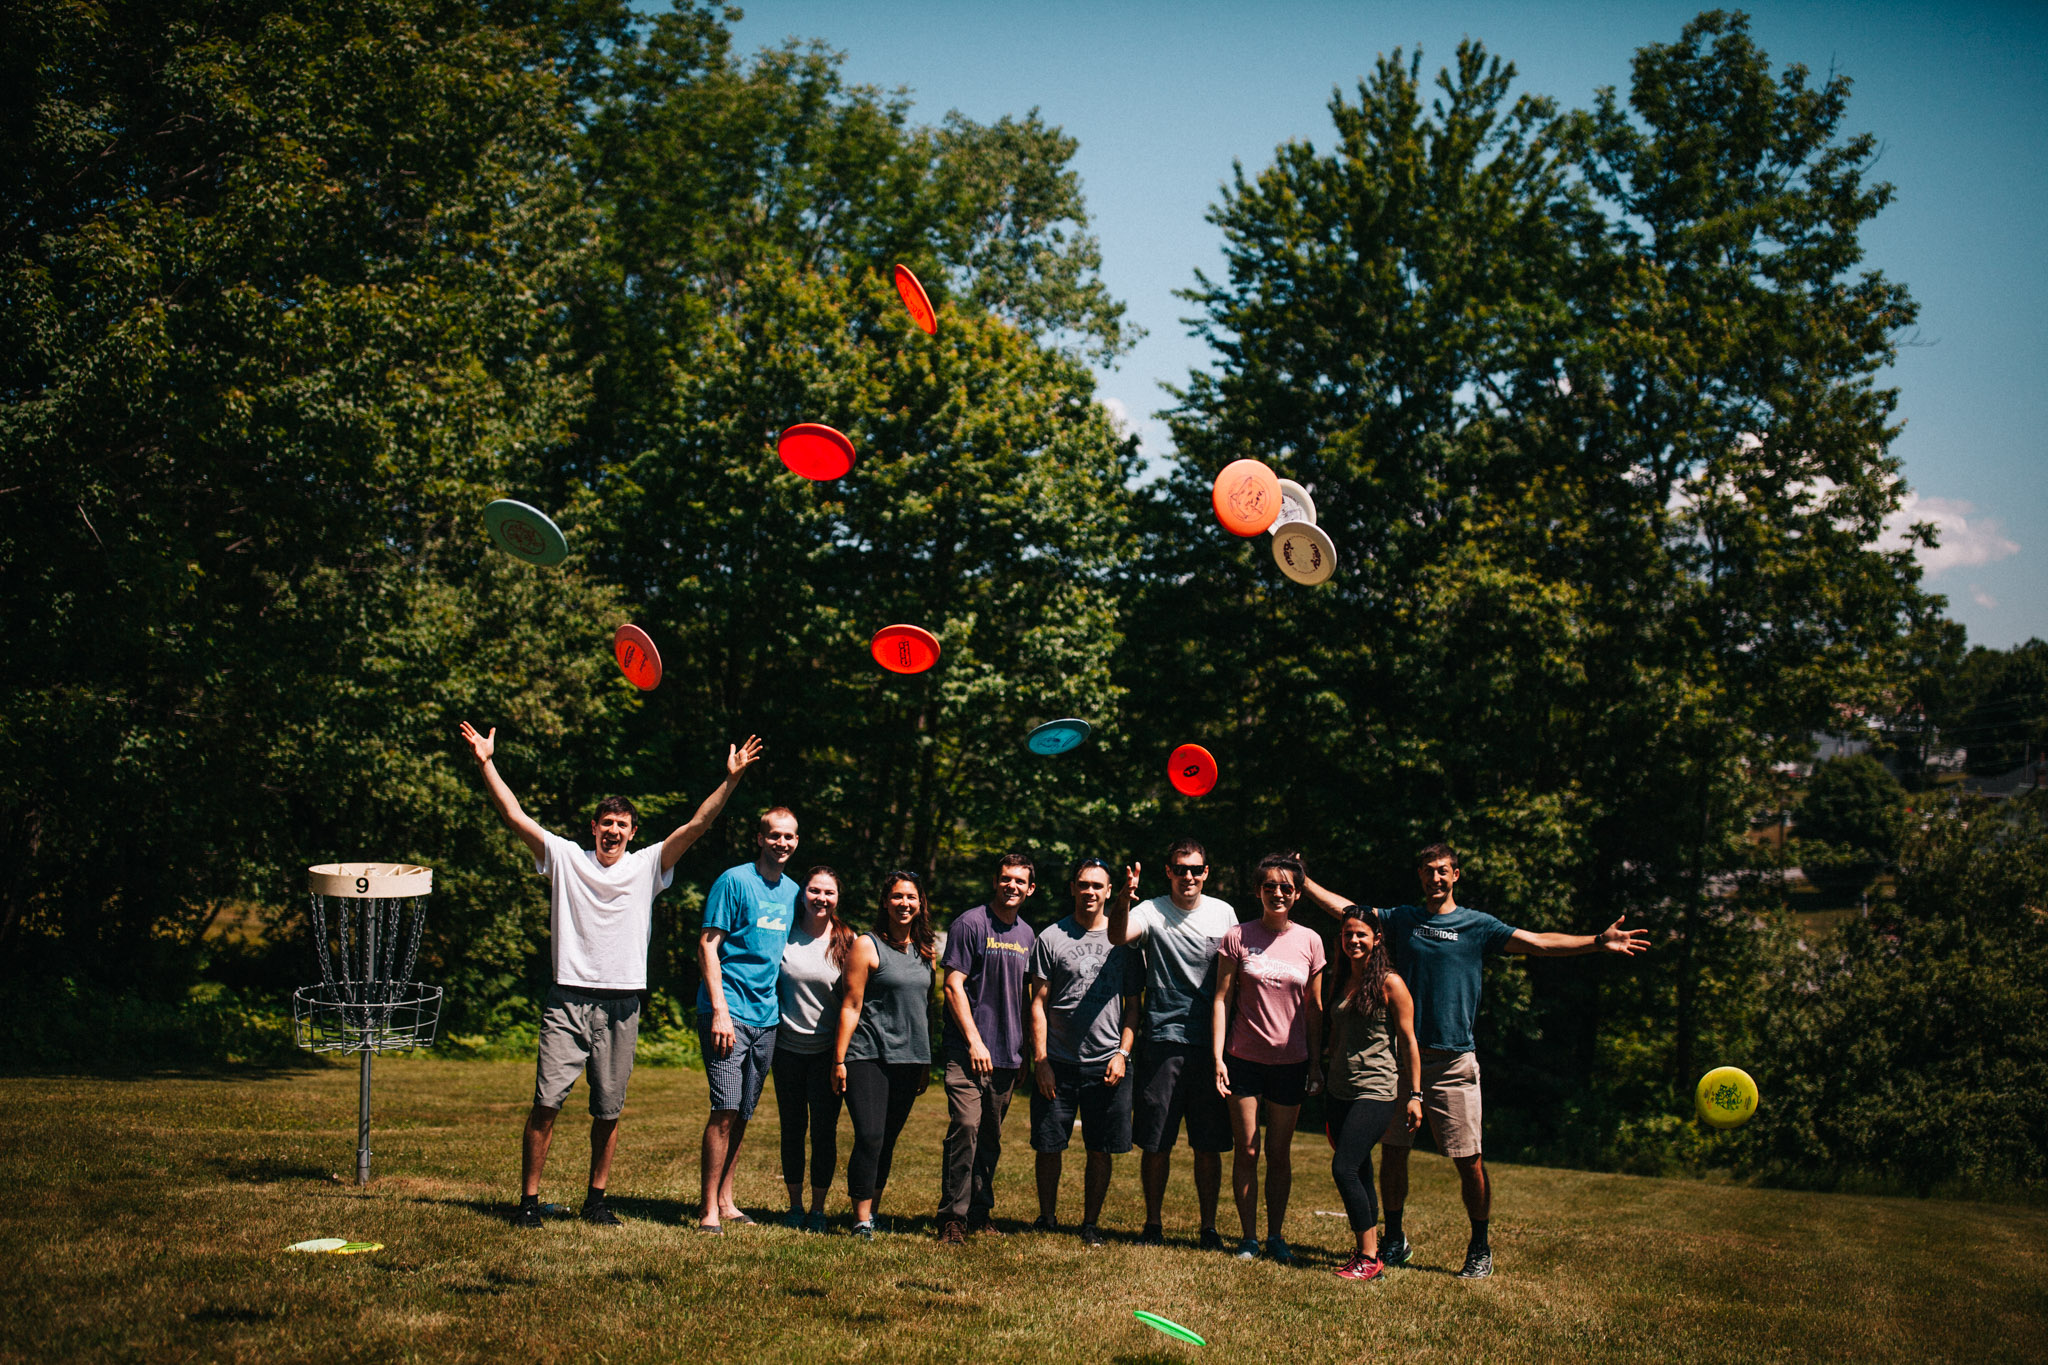 they really like frisbee.